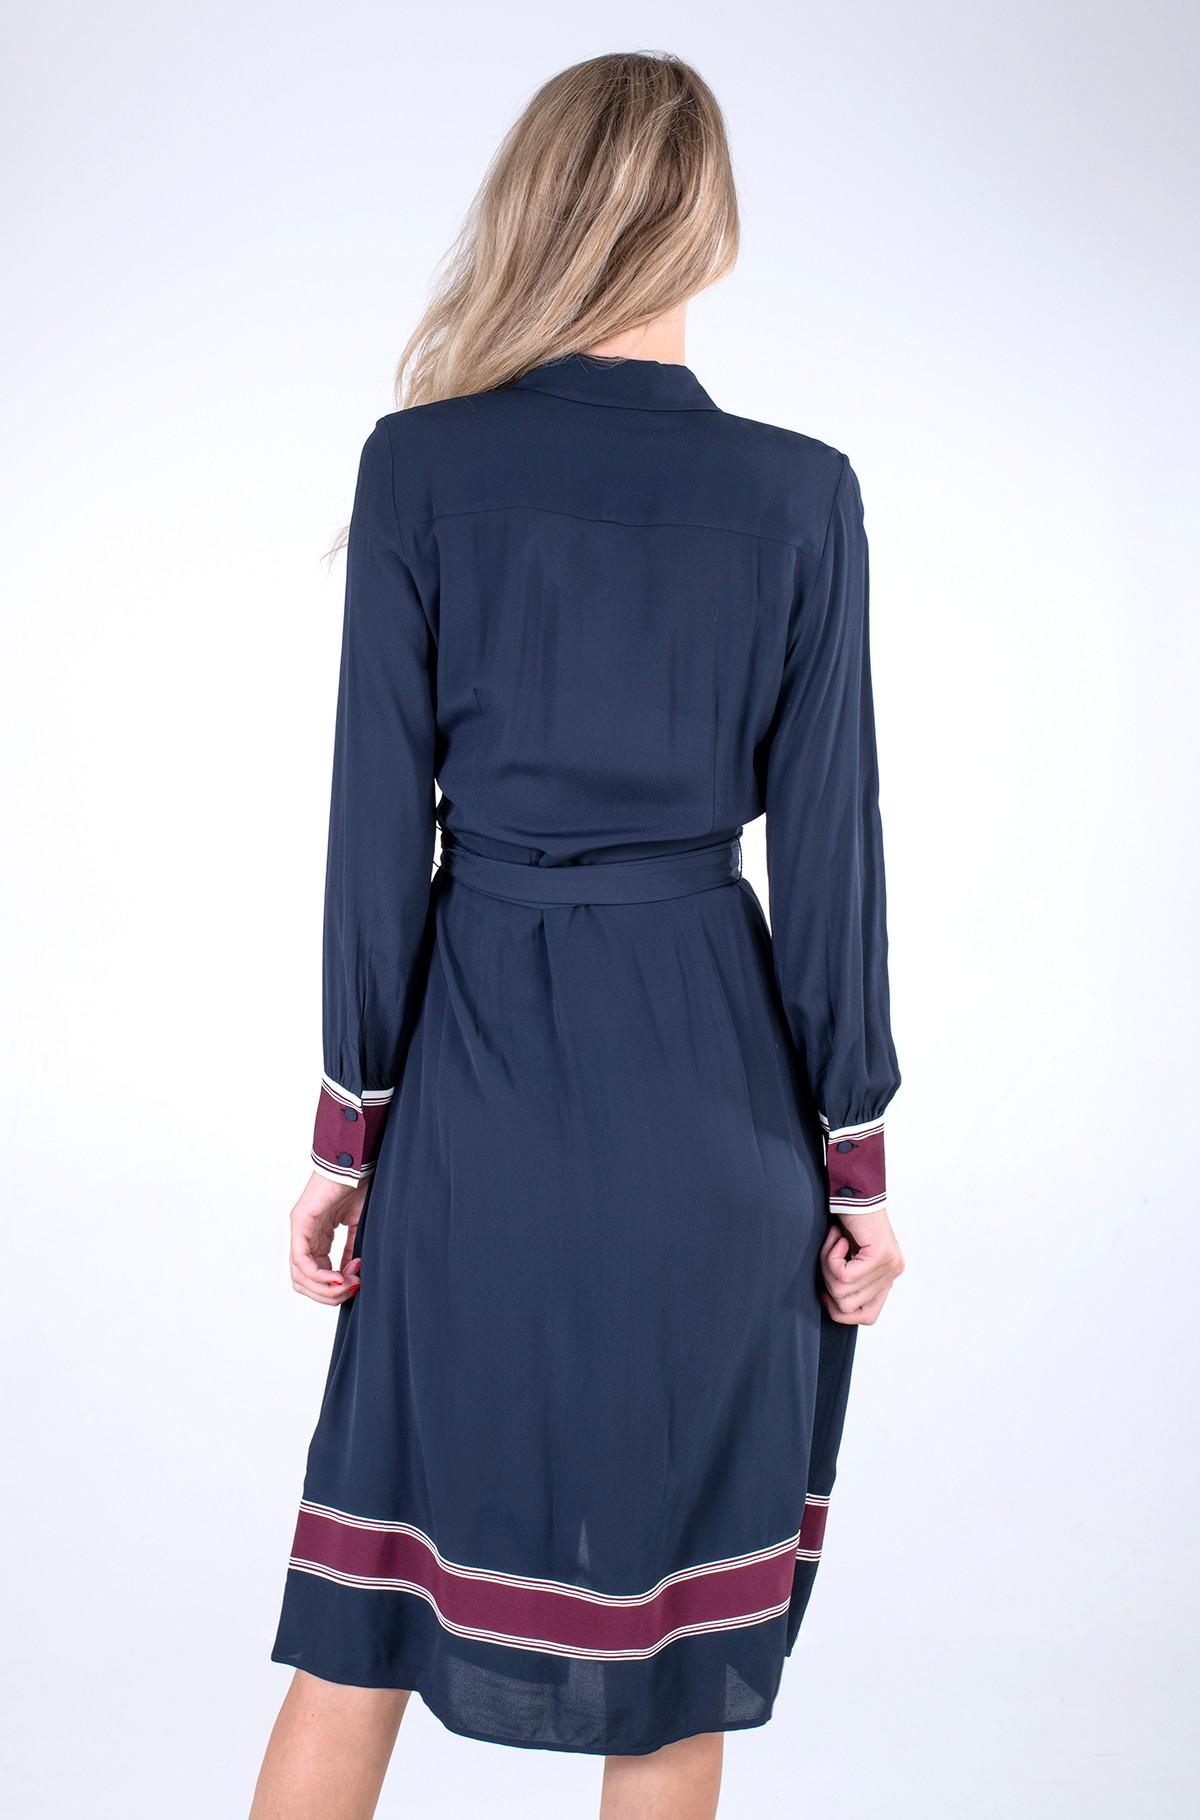 Kleit VIS CREPE MIDI SHIRT DRESS LS-full-2